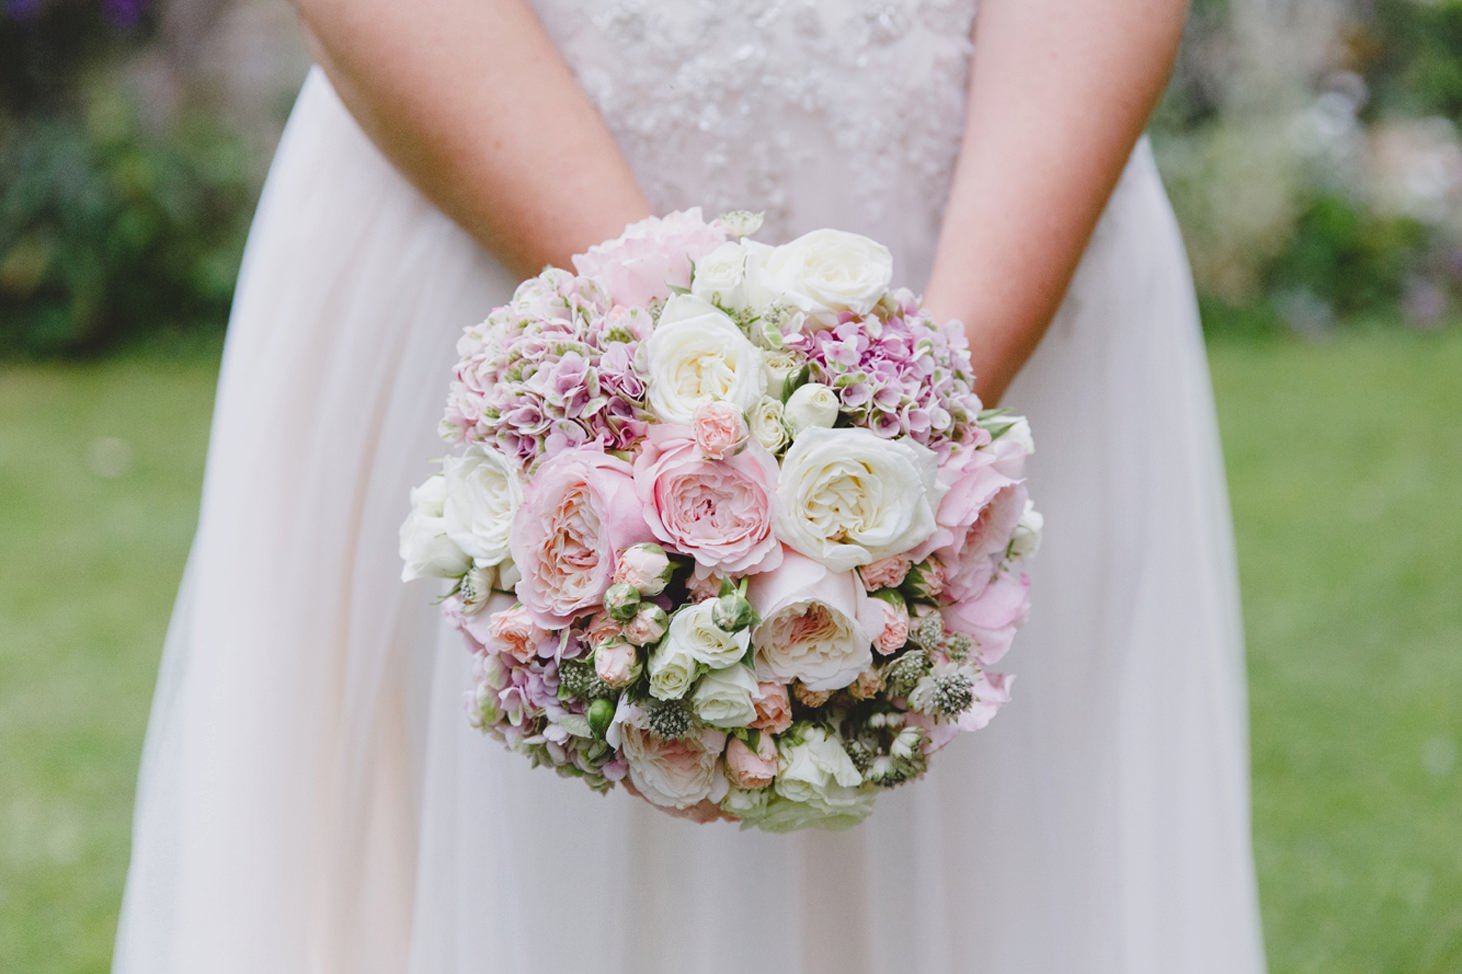 oxfordshire wedding photography brides bouquet